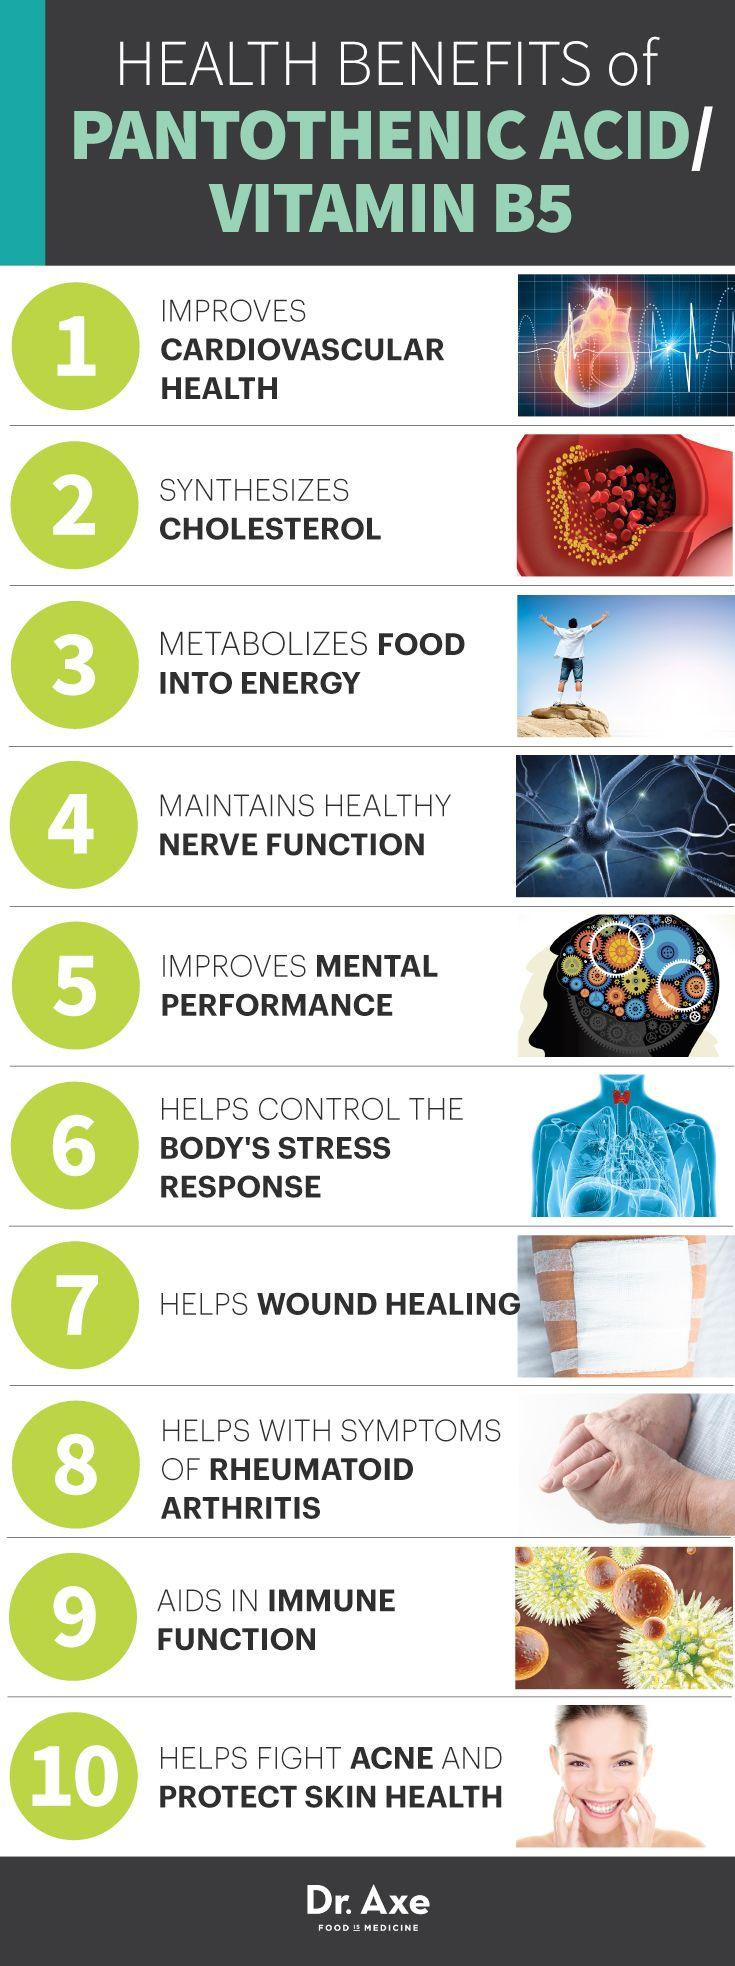 The Health Benefits of Vitamin B5